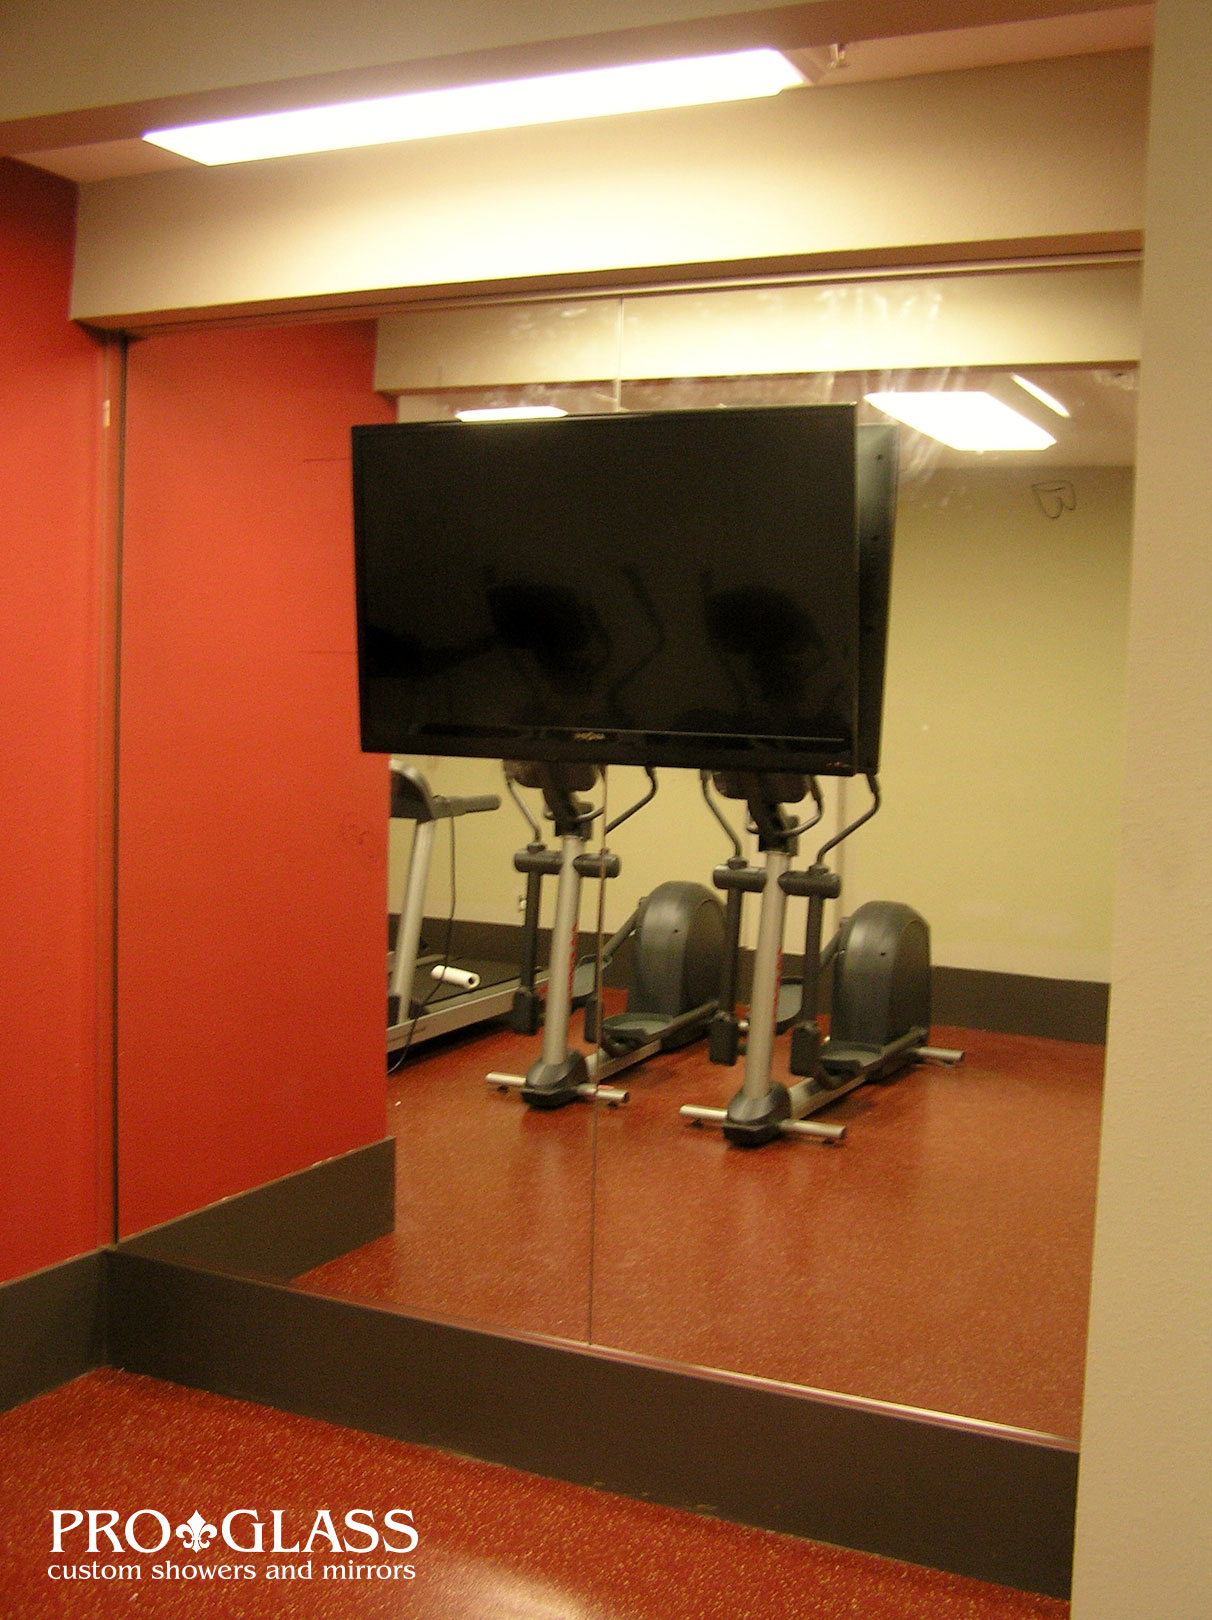 custom showers pro glass. Mirrors  ProGlass specializes in custom Custom Mirror Gallery Raleigh Company Proglass